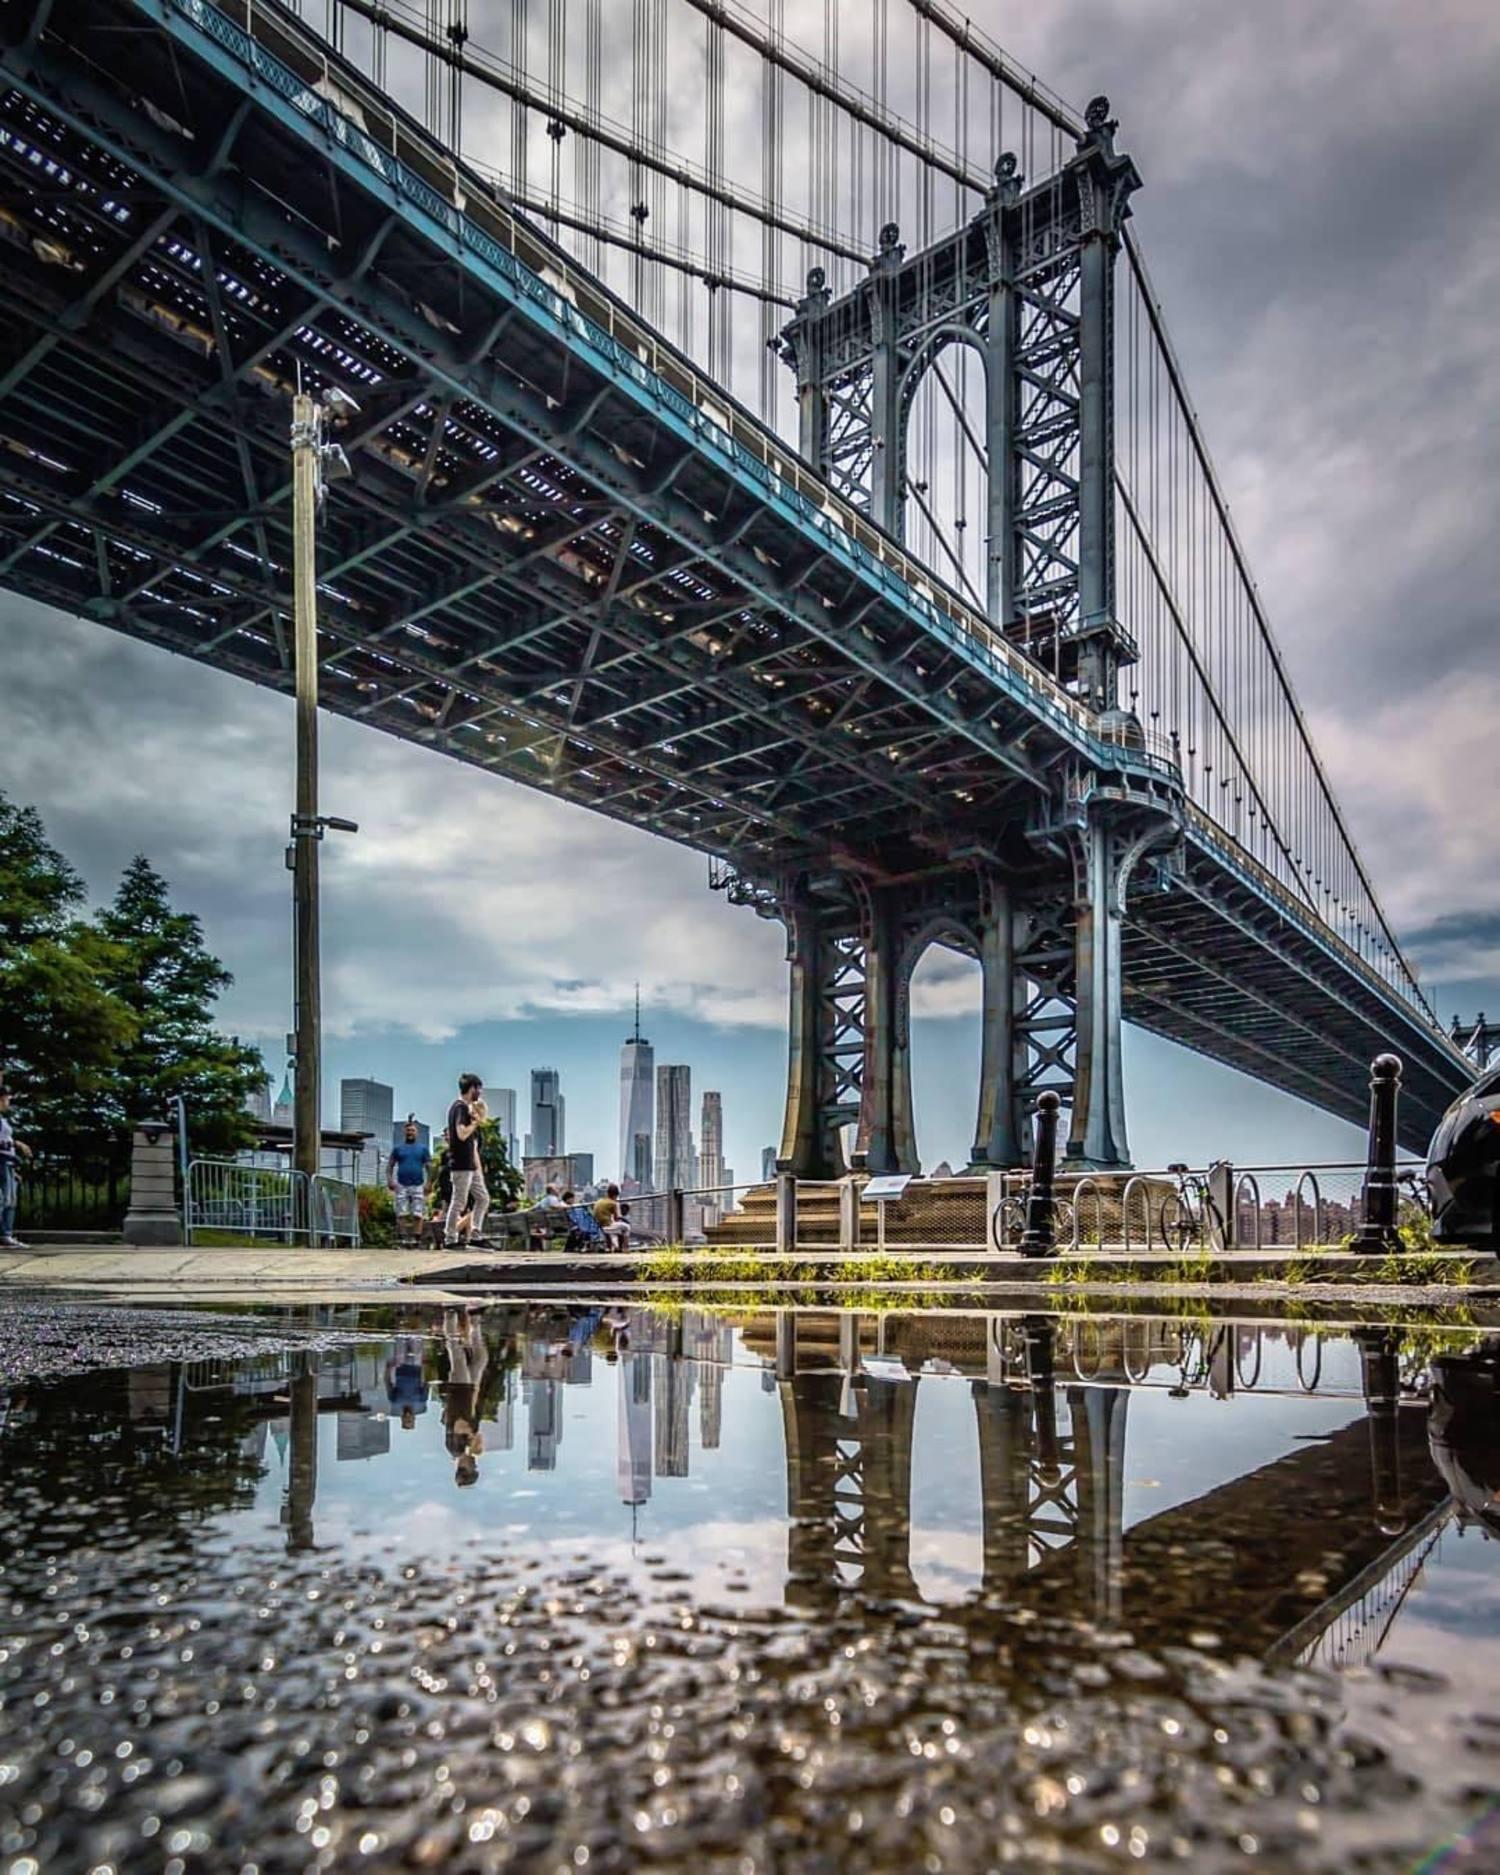 Manhattan Bridge. Photo via @everydayimshuttering #viewingnyc #newyork #newyorkcity #nyc #manhattanbridge